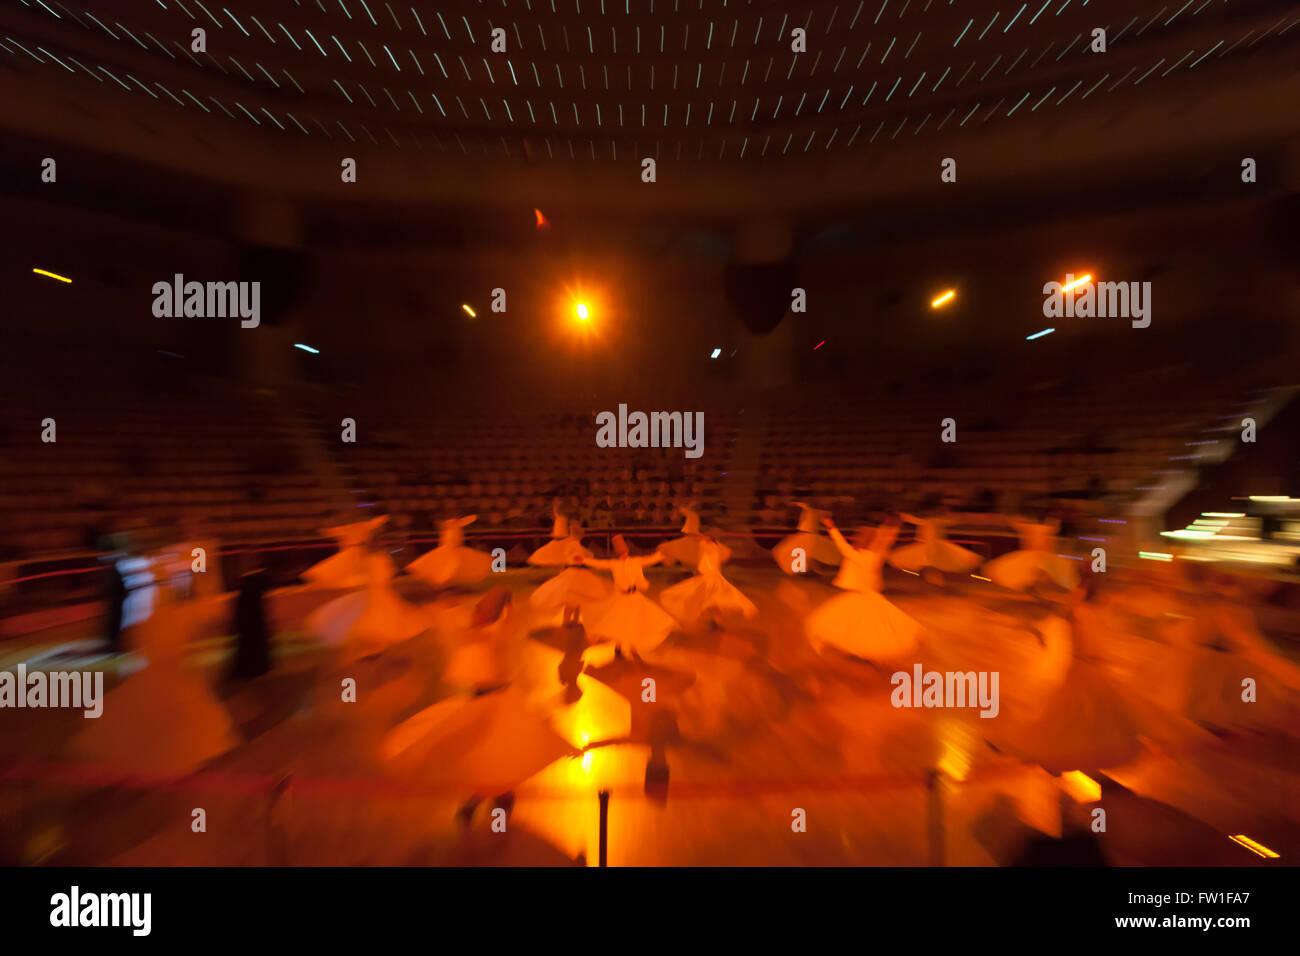 18.08-2013, Konya,Turkye. Dancing dervishes - Stock Image